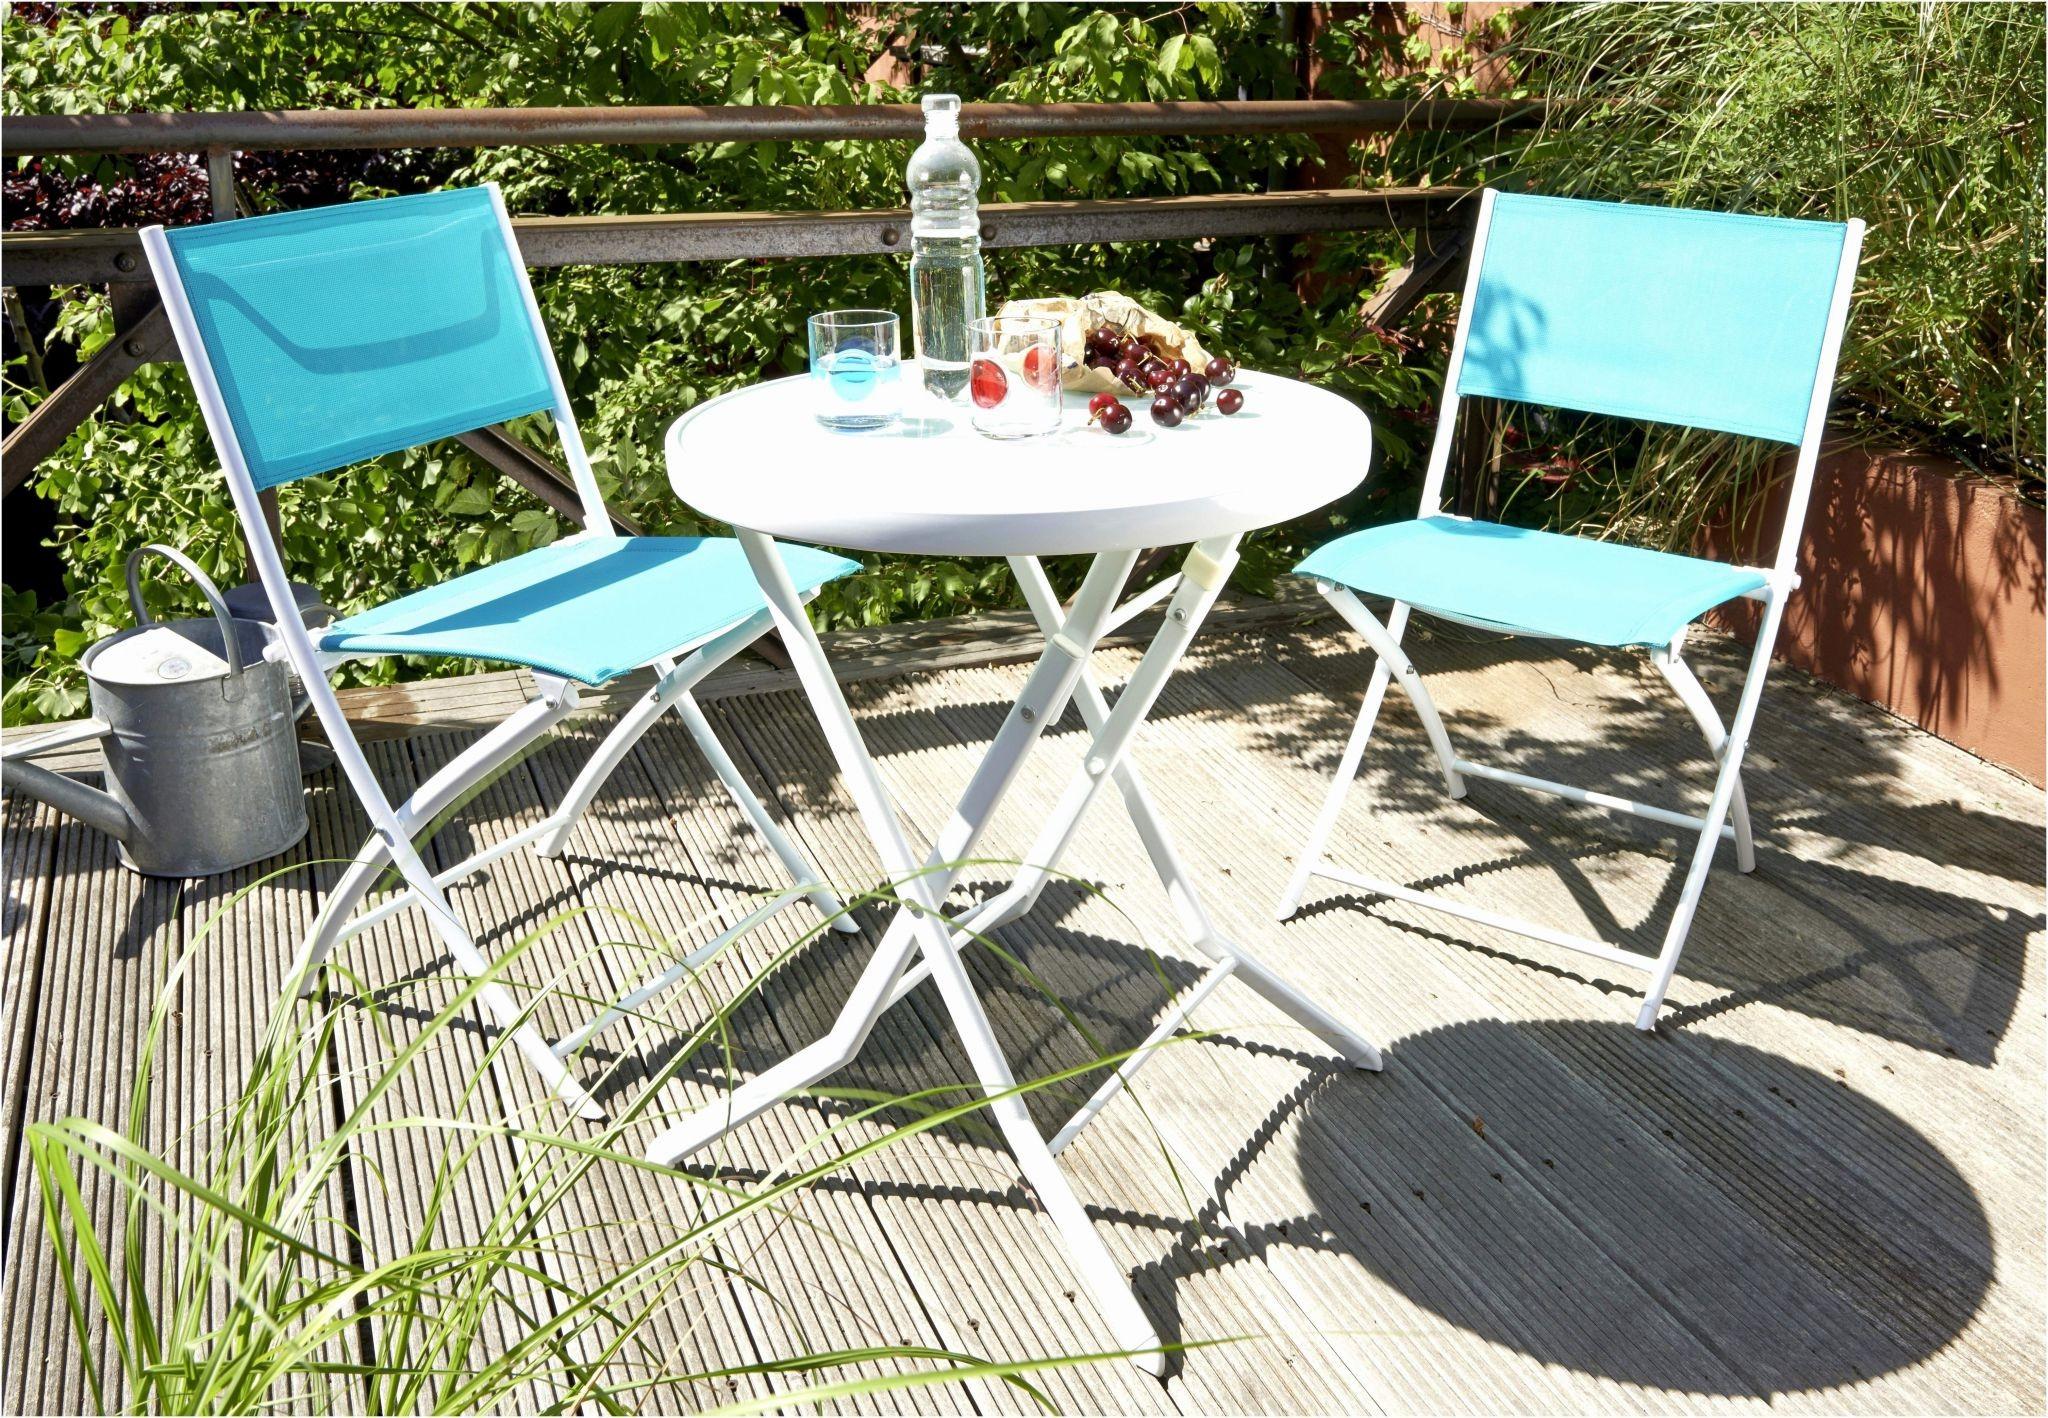 salon jardin castorama lovely tables de jardin castorama of salon jardin castorama